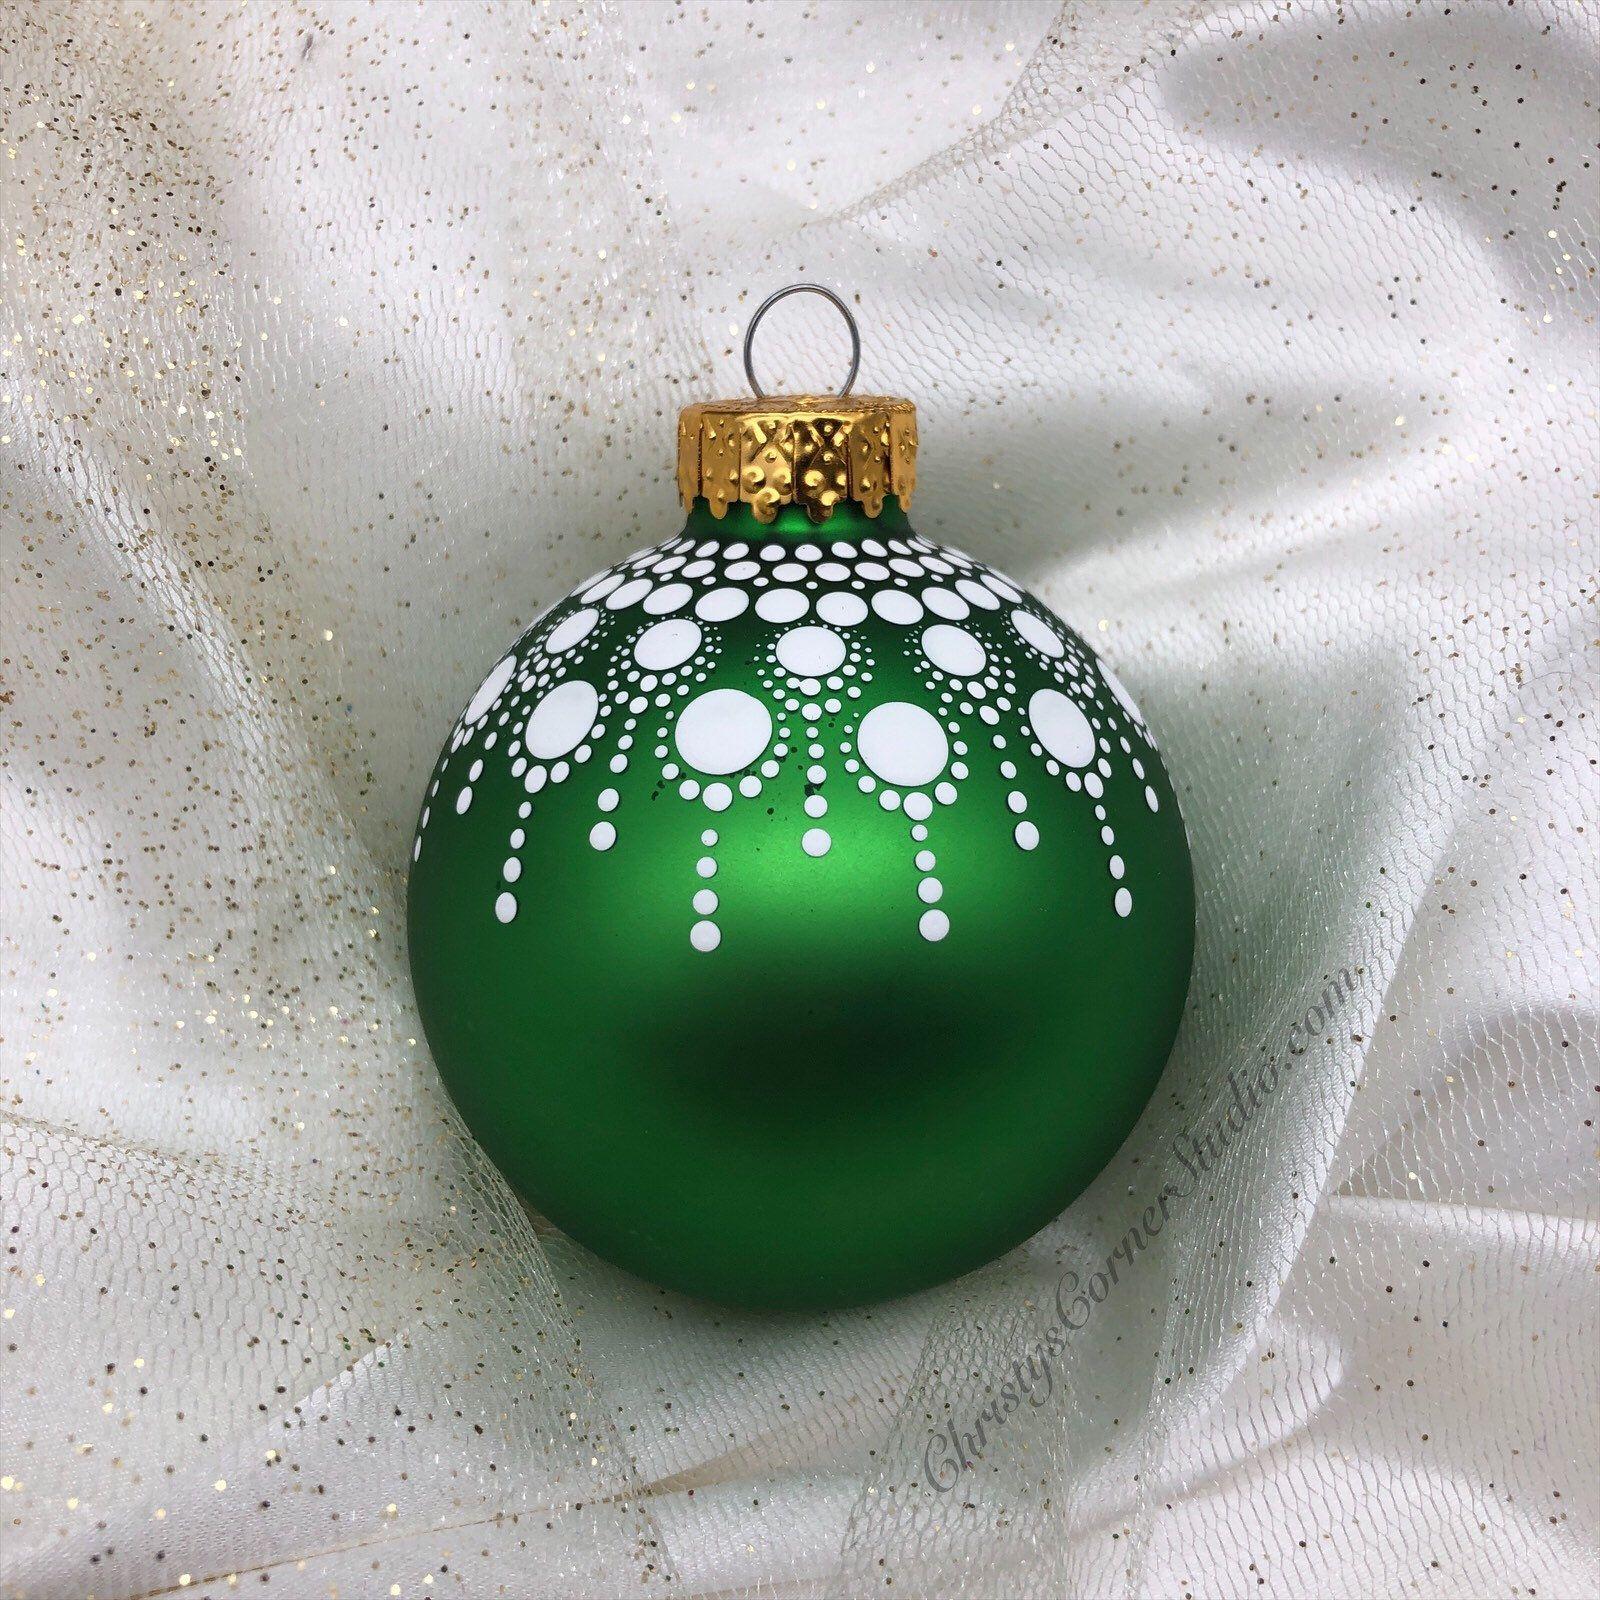 Hand Painted Green Mandala Glass Christmas Ornament Green Etsy Christmas Ornaments Glass Christmas Ornaments Painted Christmas Ornaments